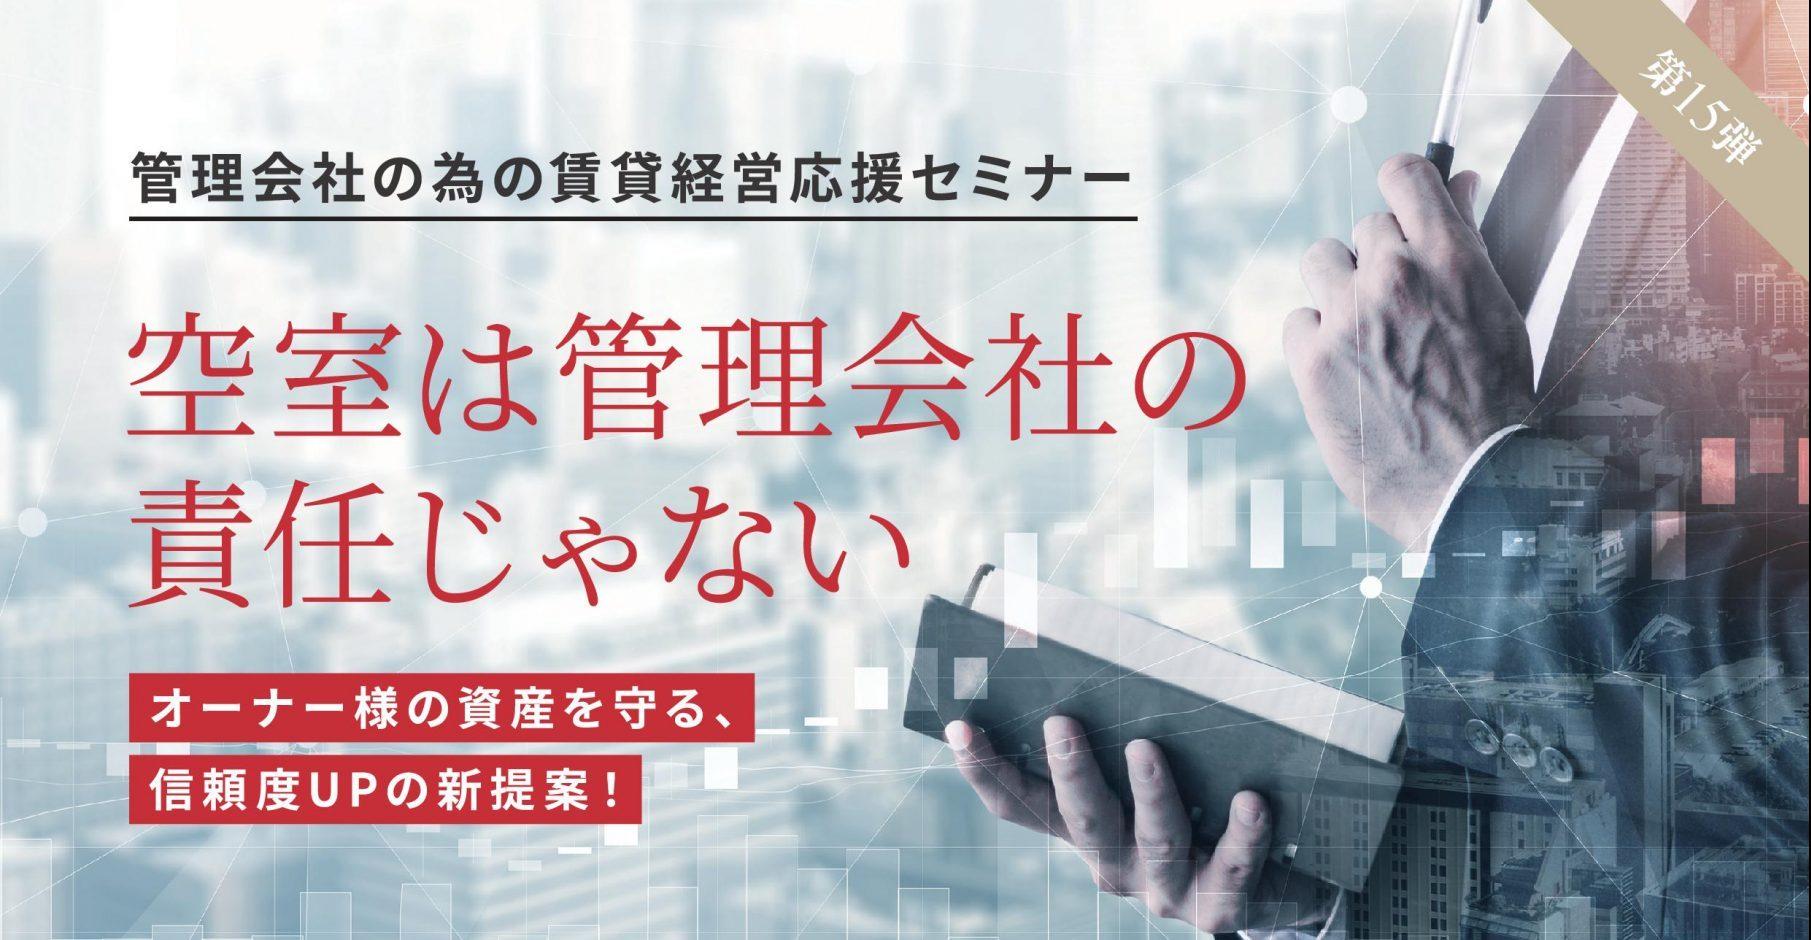 2/9(火)   管理会社様向け賃貸経営応援セミナー開催